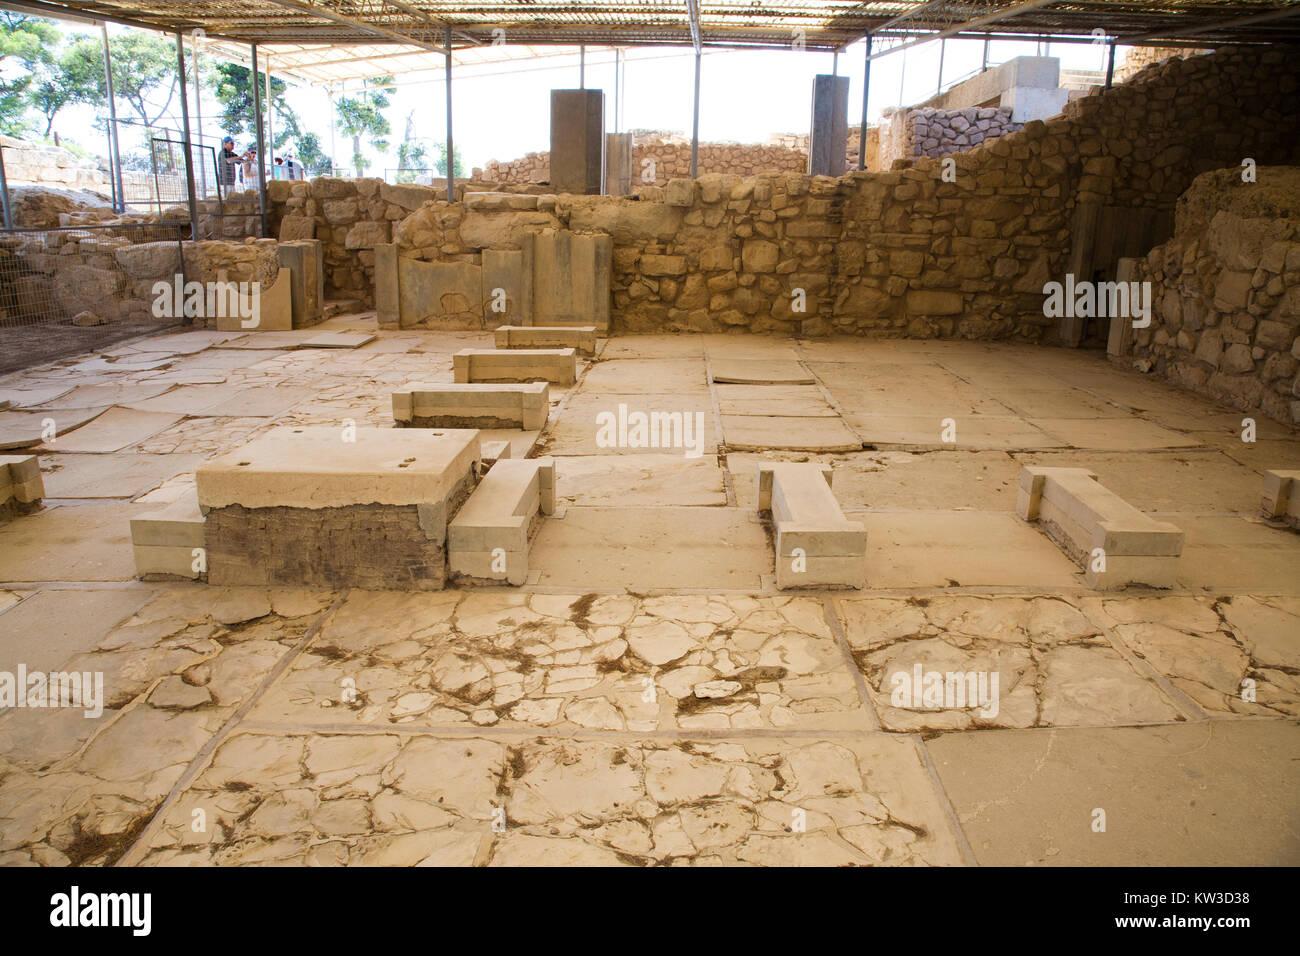 The king megaron, royal apartments, Festos, archeological area, Crete island, Greece, Europe Stock Photo